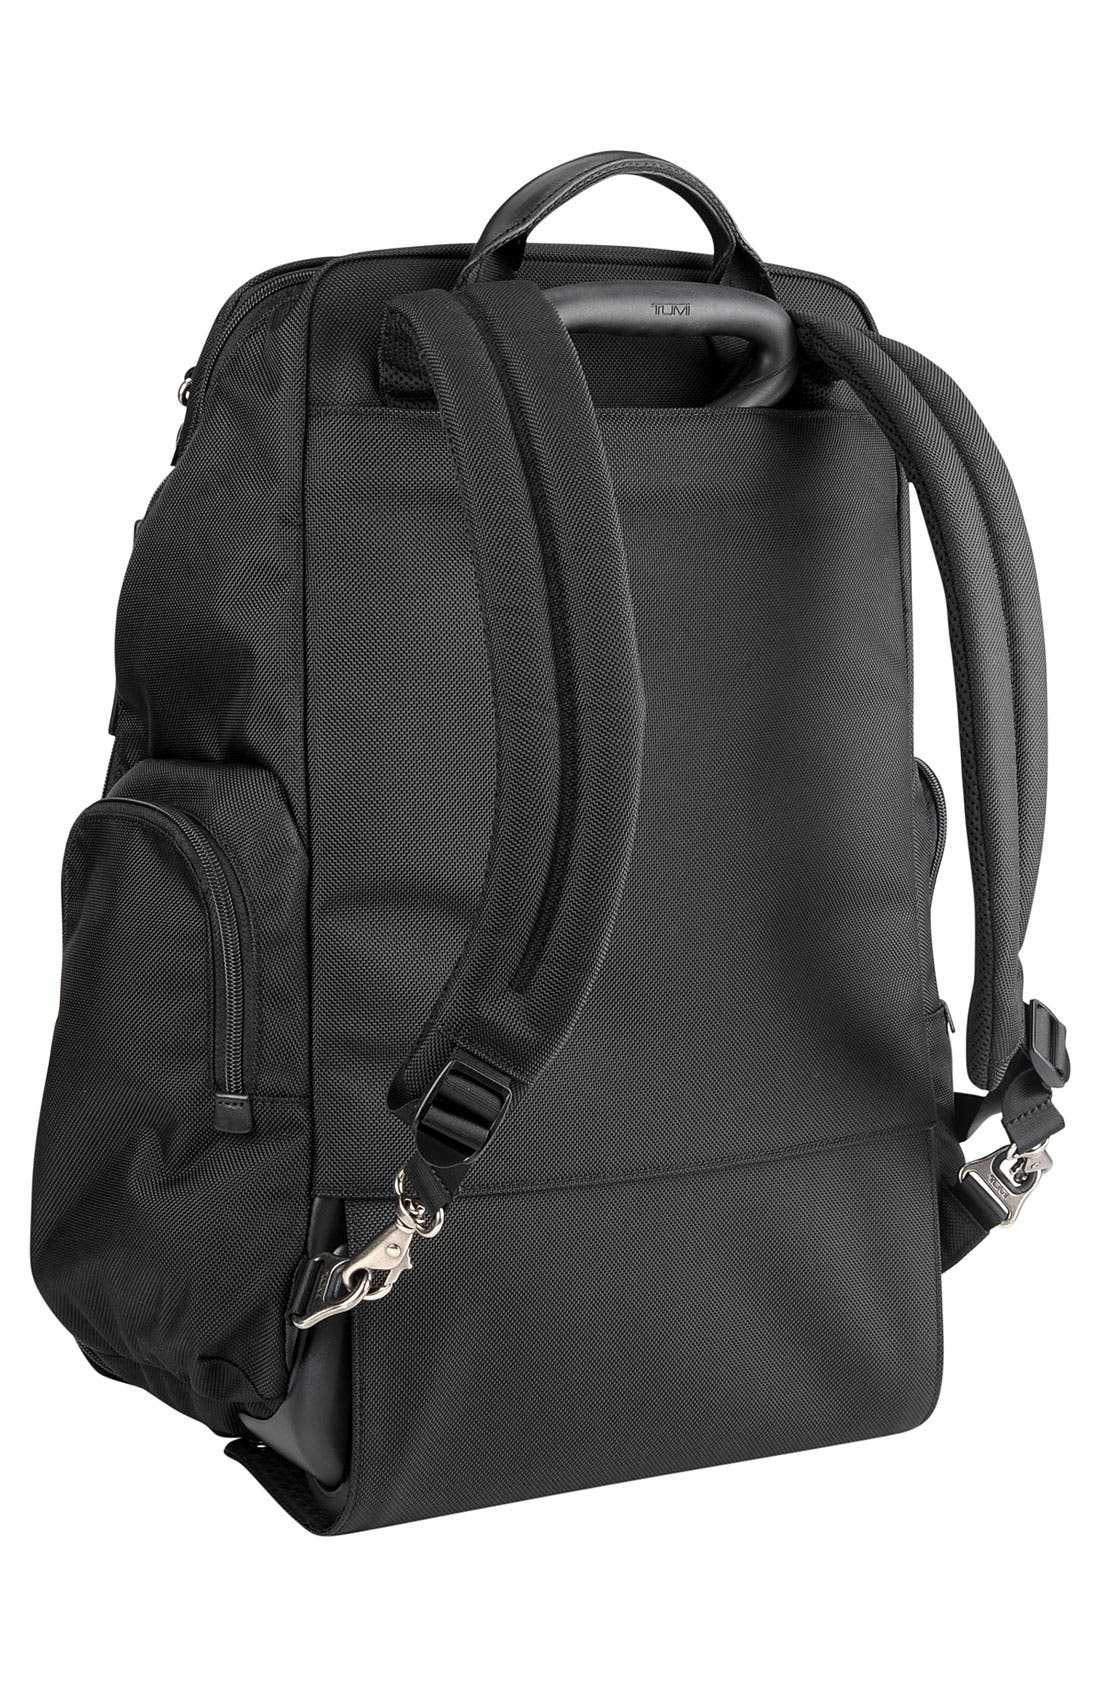 Alternate Image 3  - Tumi 'Alpha Bravo - Lemoore' Wheeled Backpack (21 Inch)